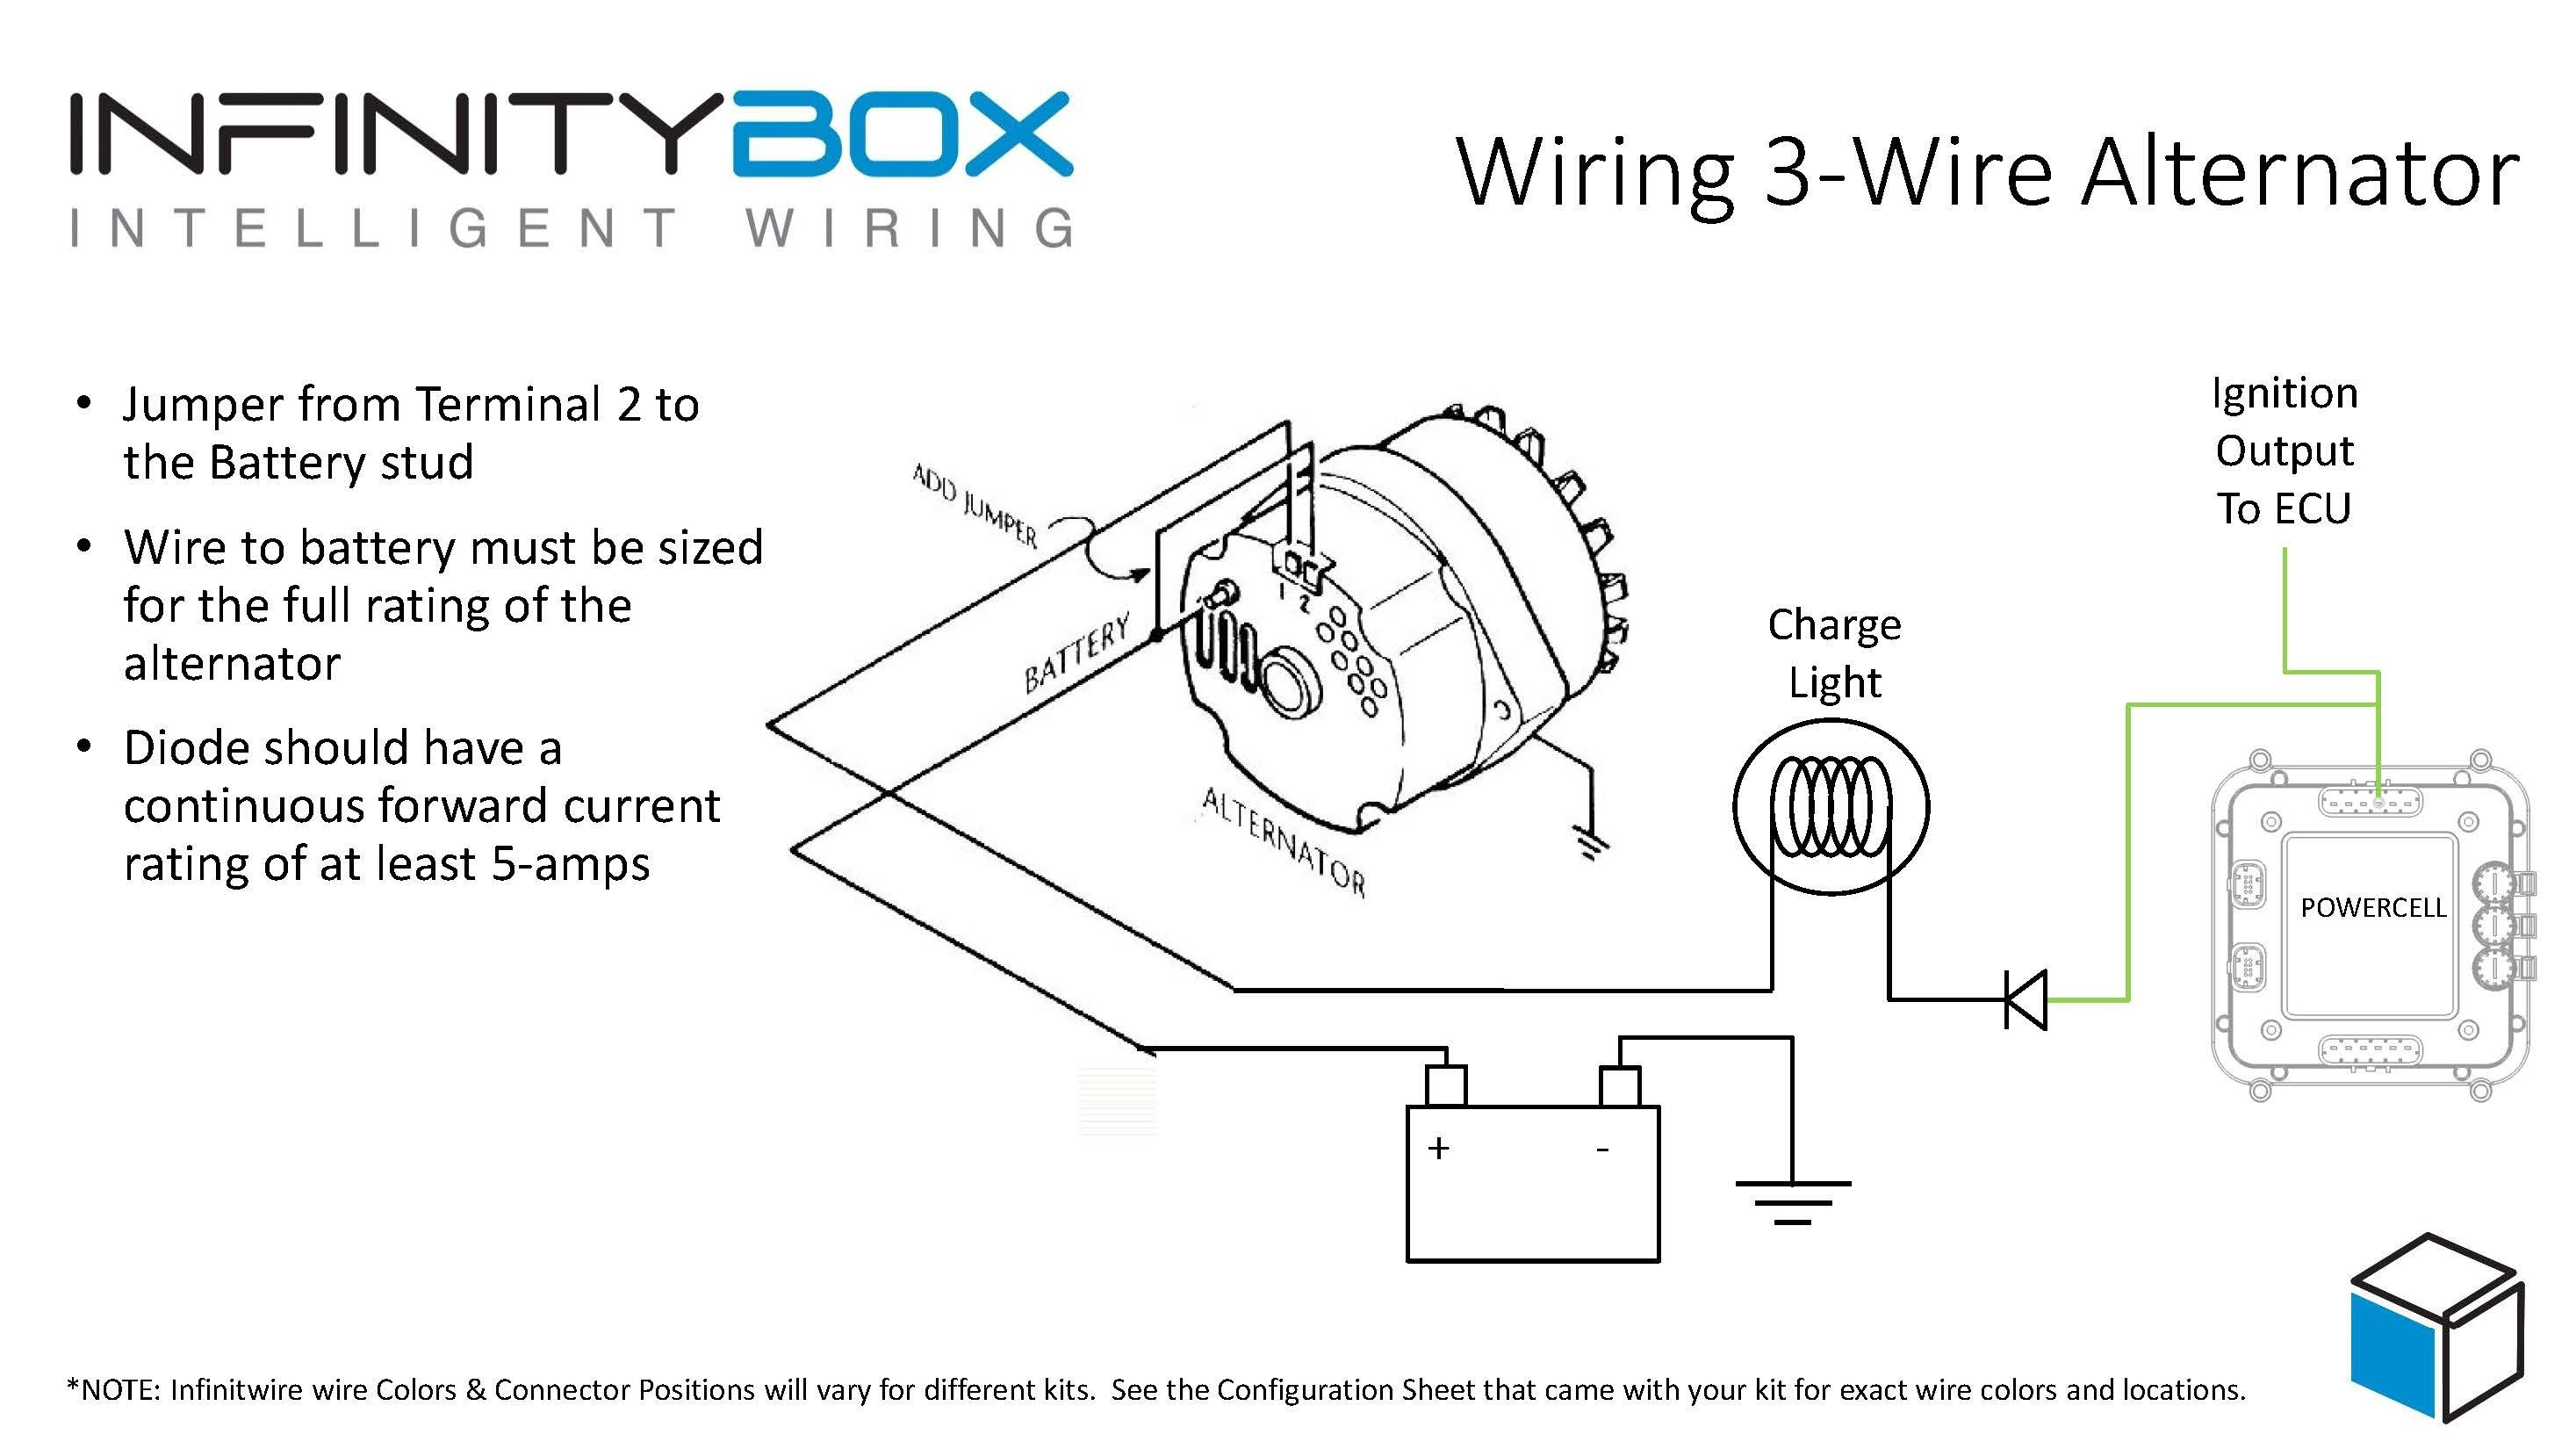 Ford 4 Wire Alternator Diagram Explained Wiring Diagrams Distributor Wiring  Diagram 1978 351m Motorcraft Alternator Wiring Diagram